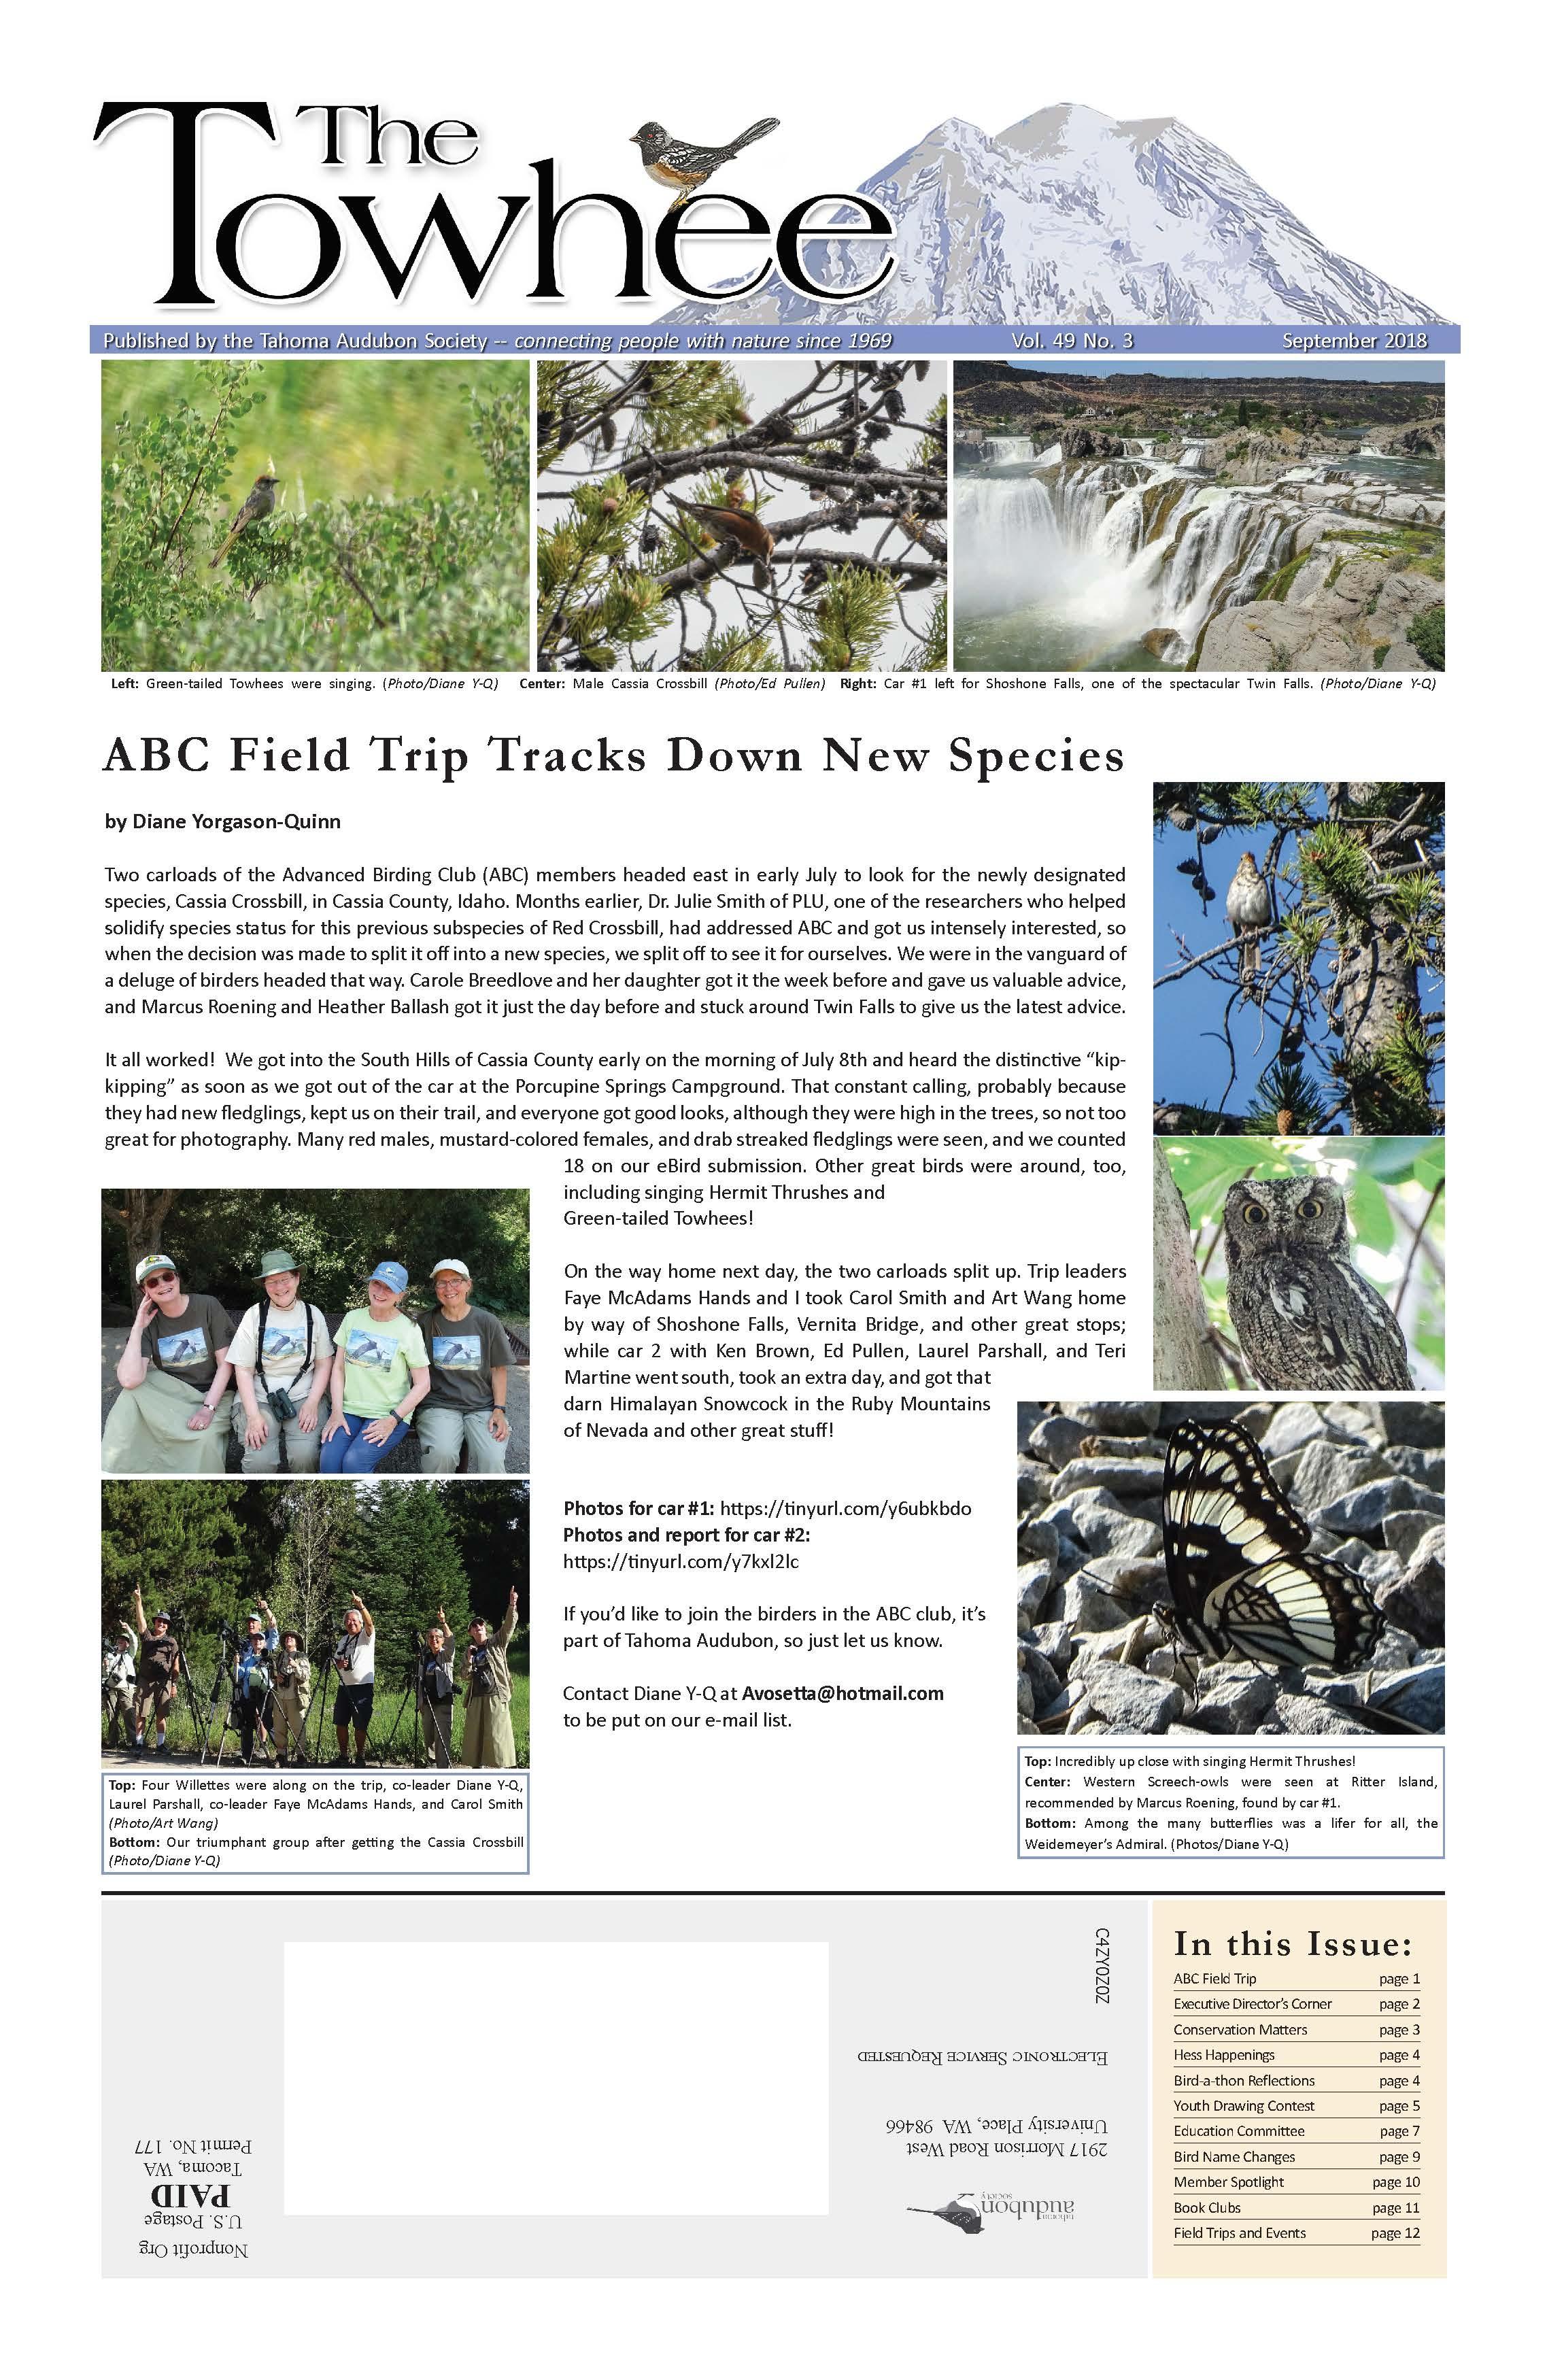 Tacoma Audubon Newspaper